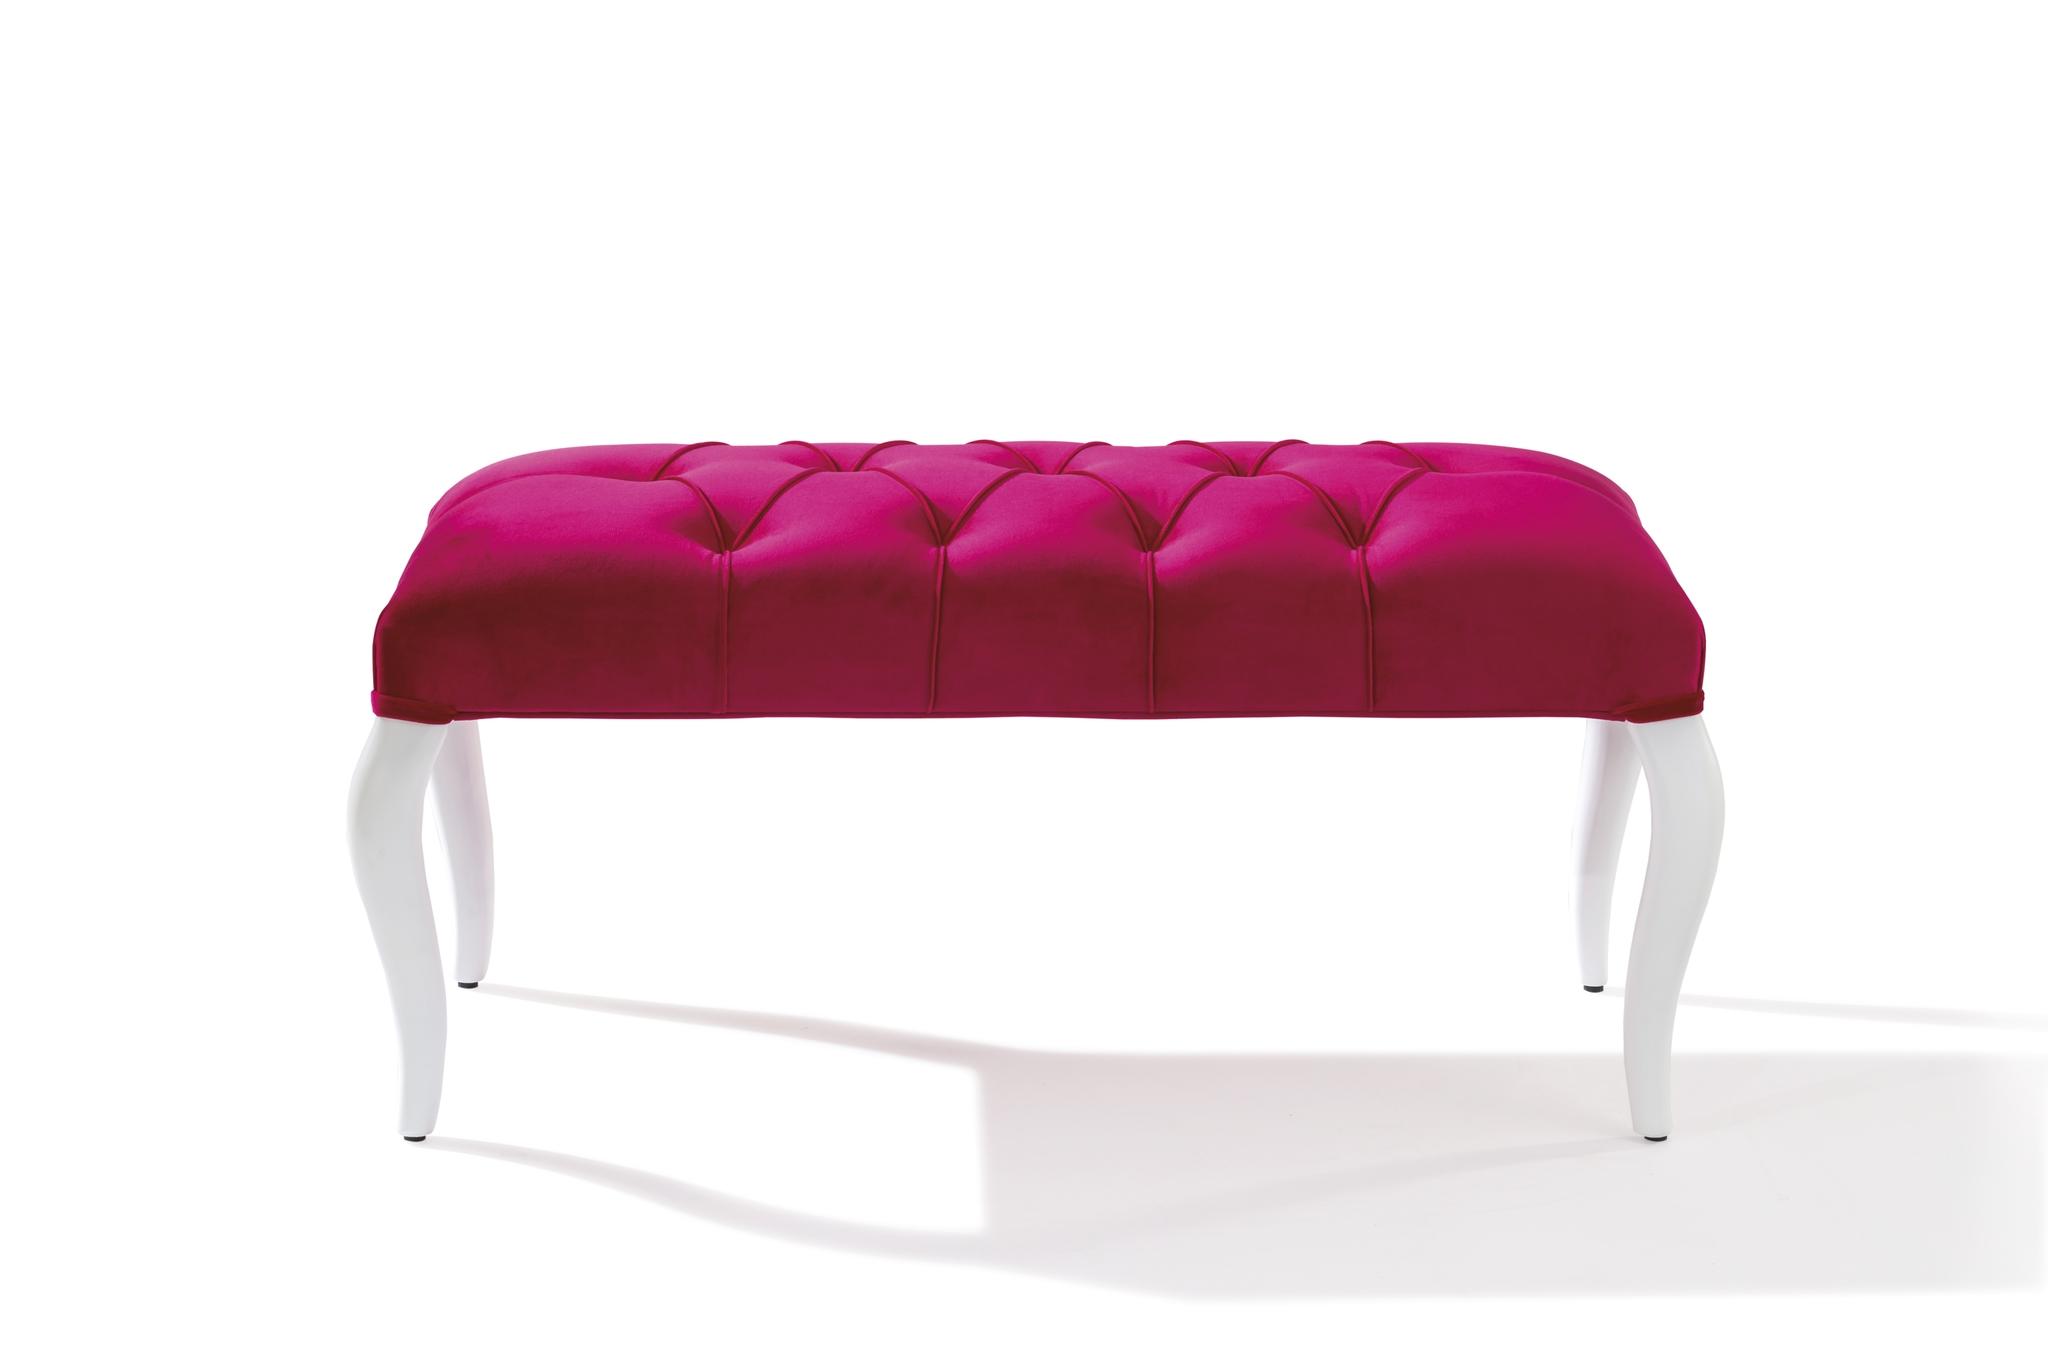 Banca tapitata cu stofa, cu picioare din lemn Rose Pink, l90xA44xH44 cm imagine